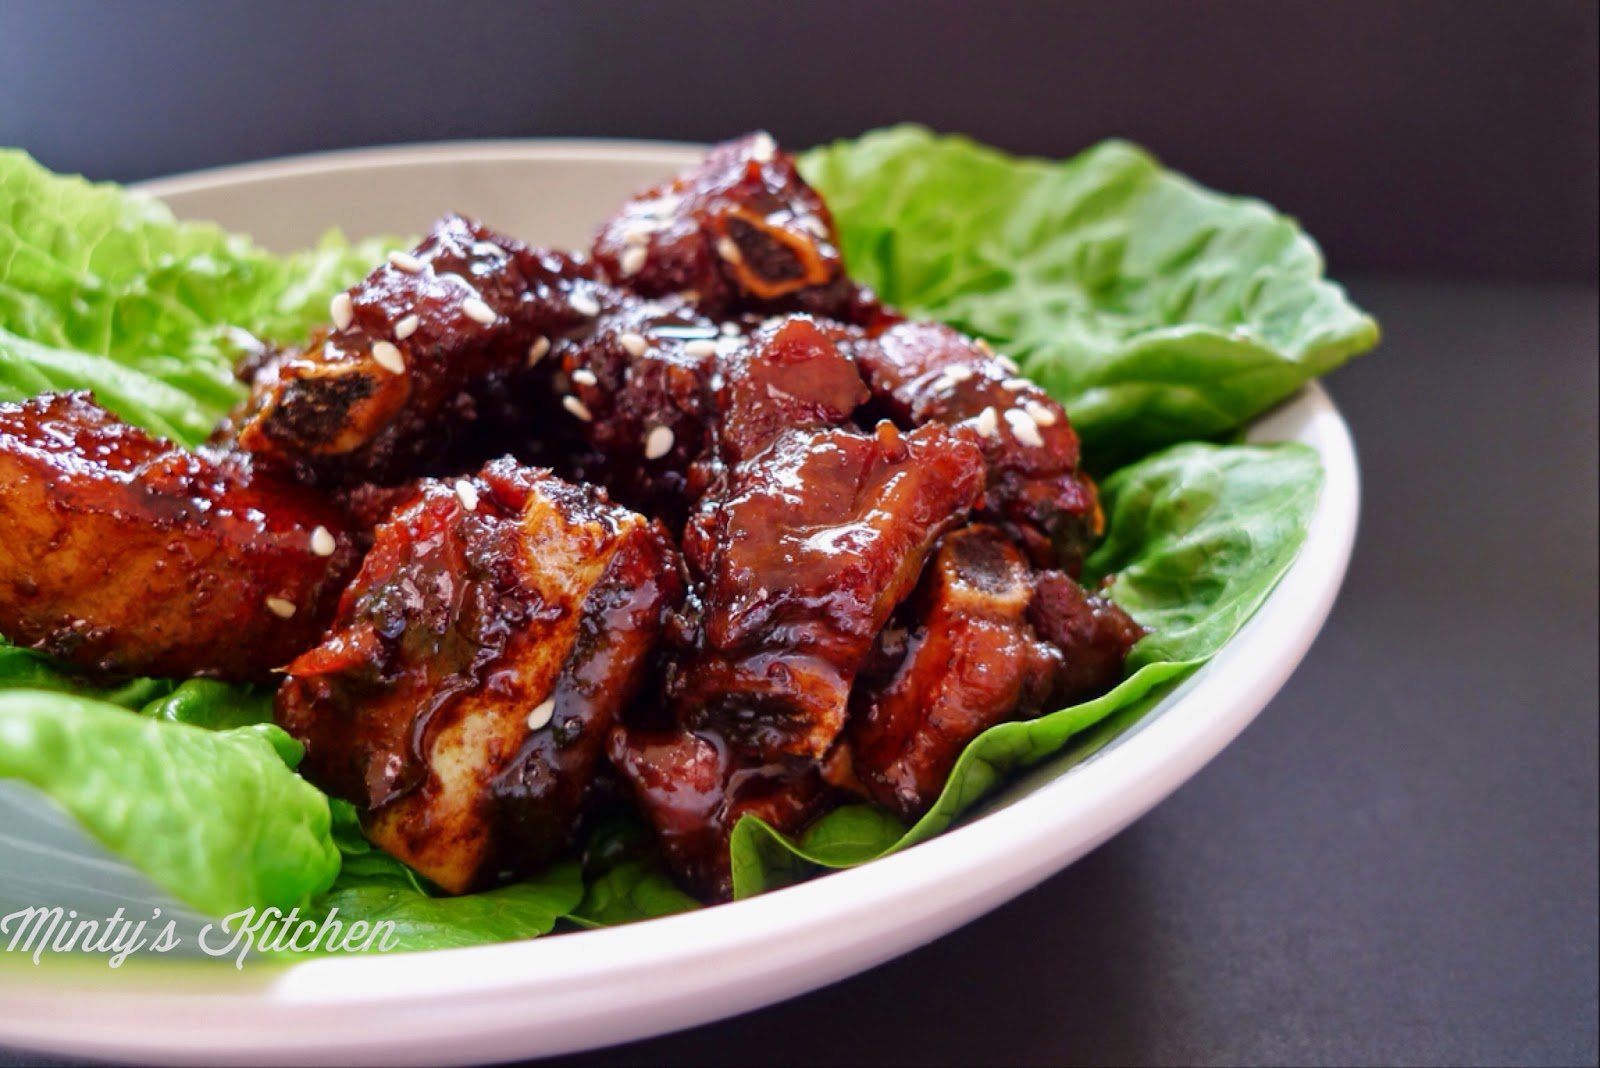 Braised Sweet & Sour Chinkiang Vinegar Spare Ribs (浙江糖醋排骨)